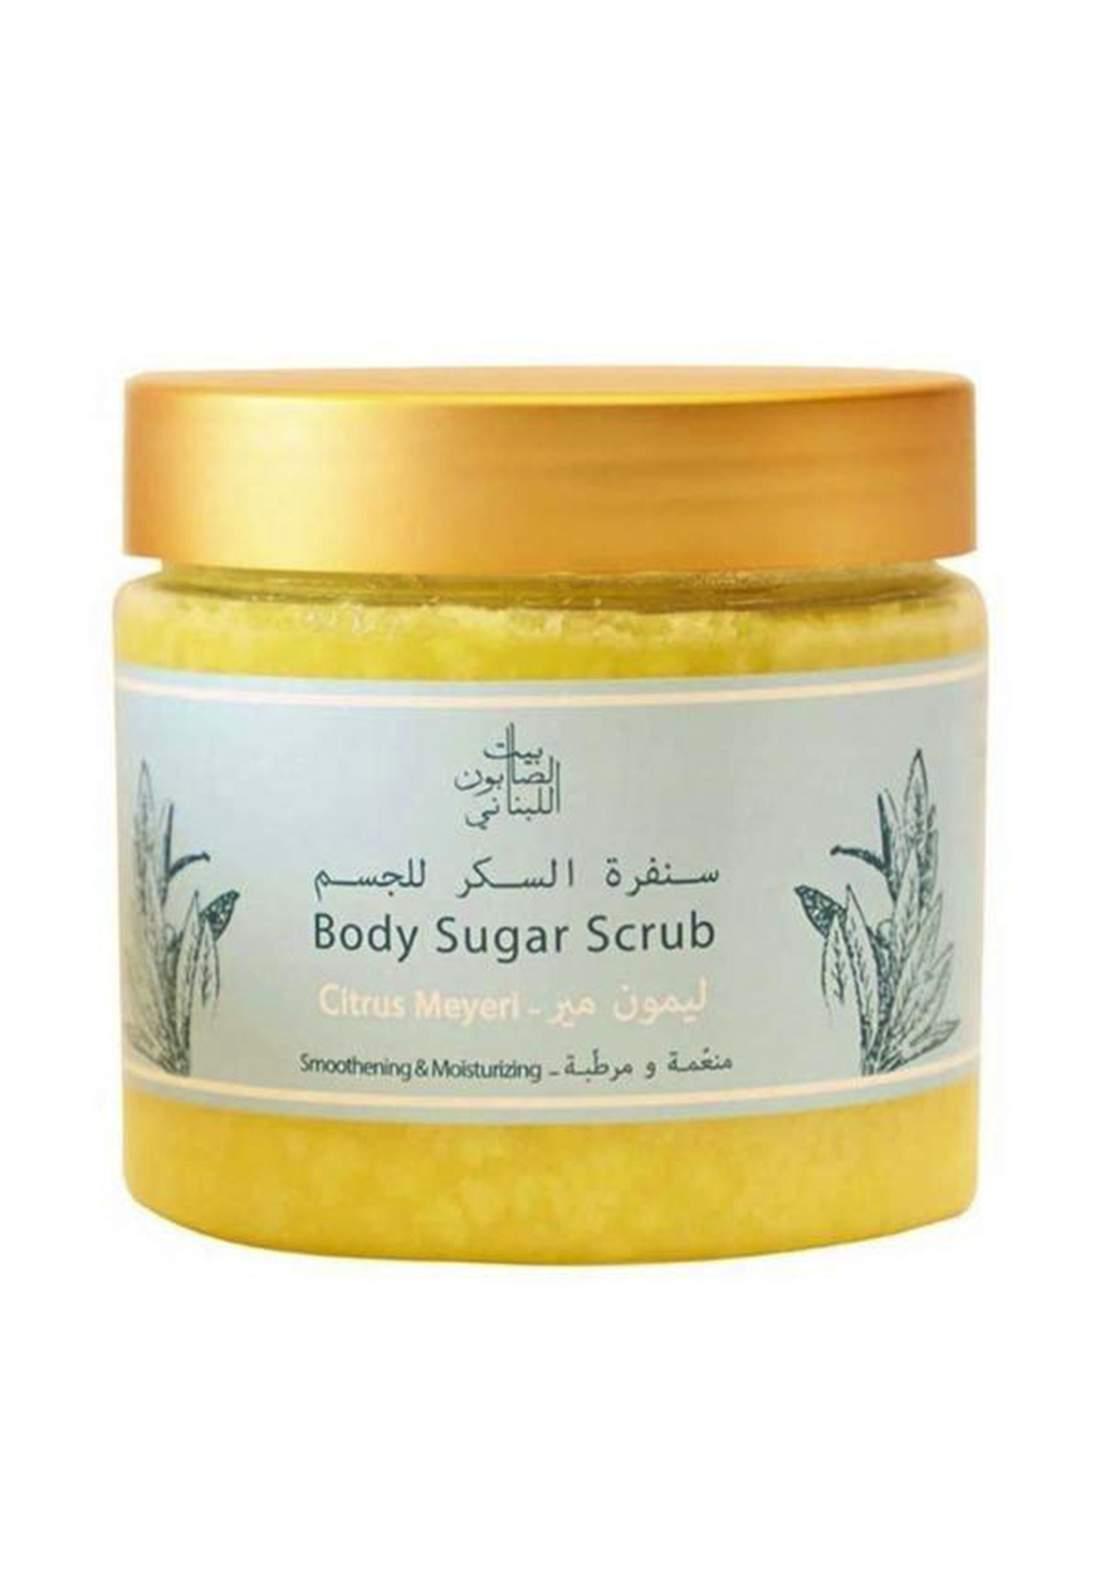 Bayt Alsaboun Alloubnani-317477 Body Sugar Scrub Citrus Meyeri 500g سنفرة للجسم